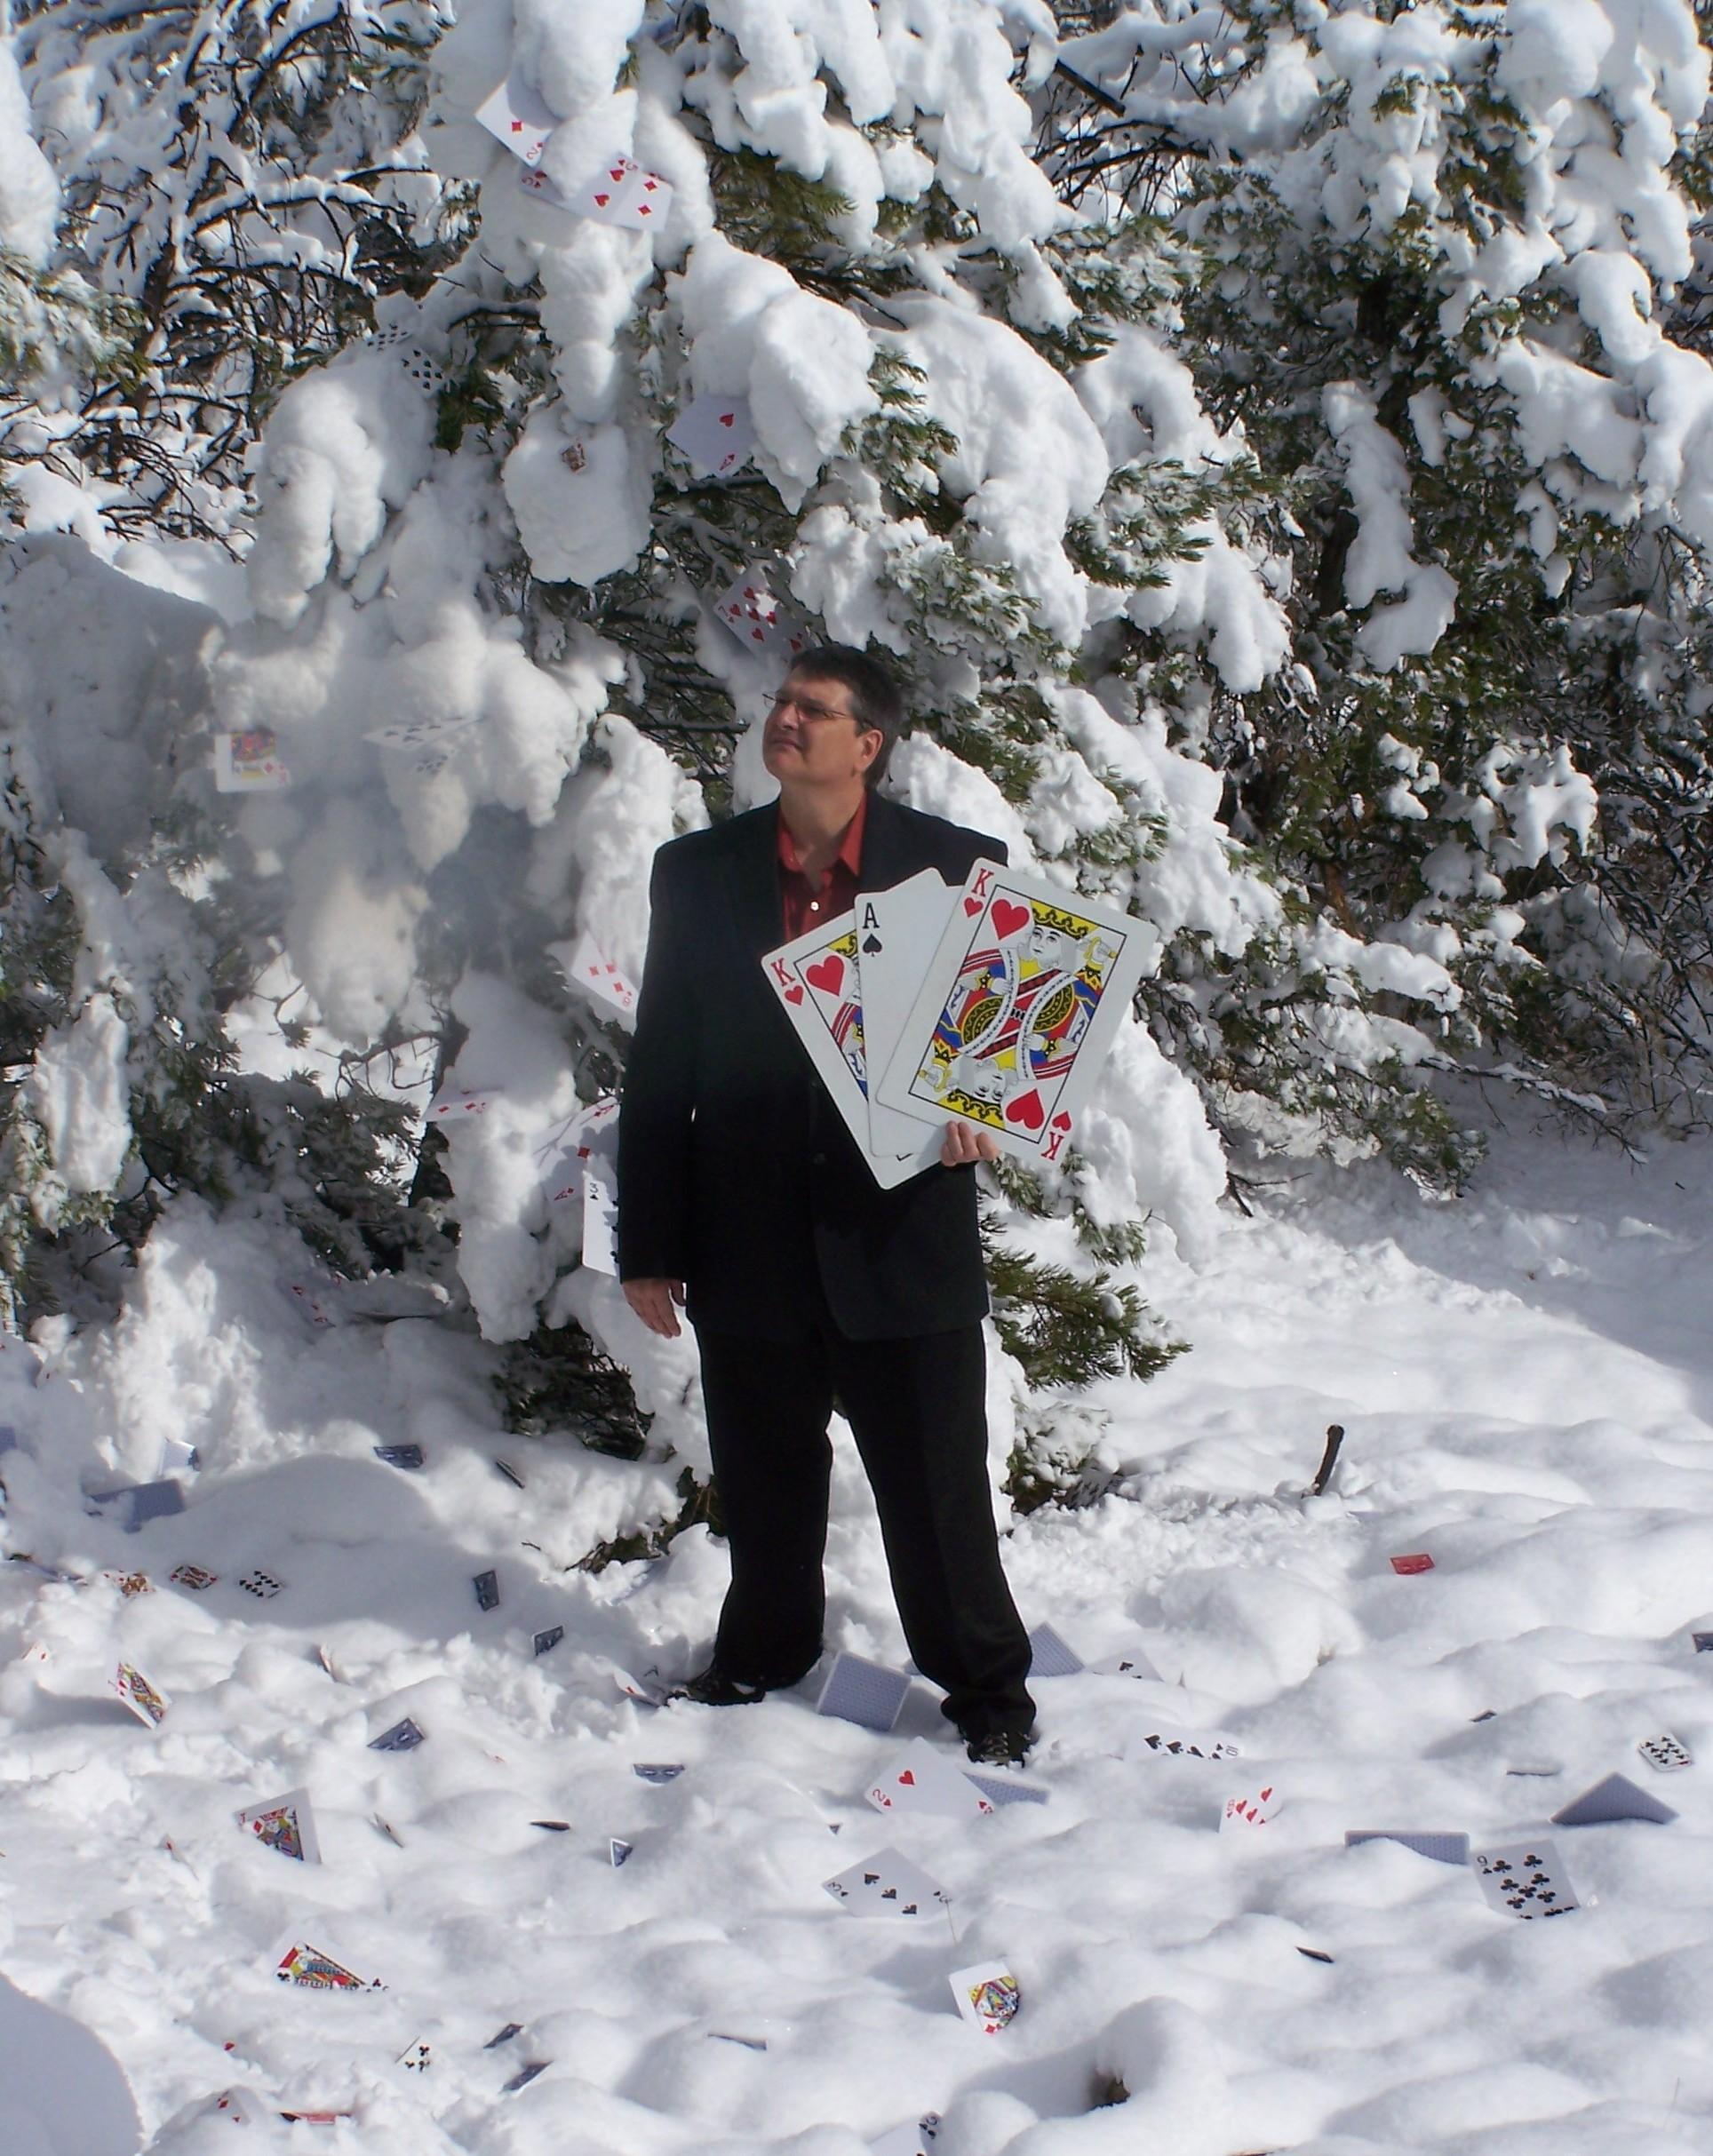 Snow cards promo pic.